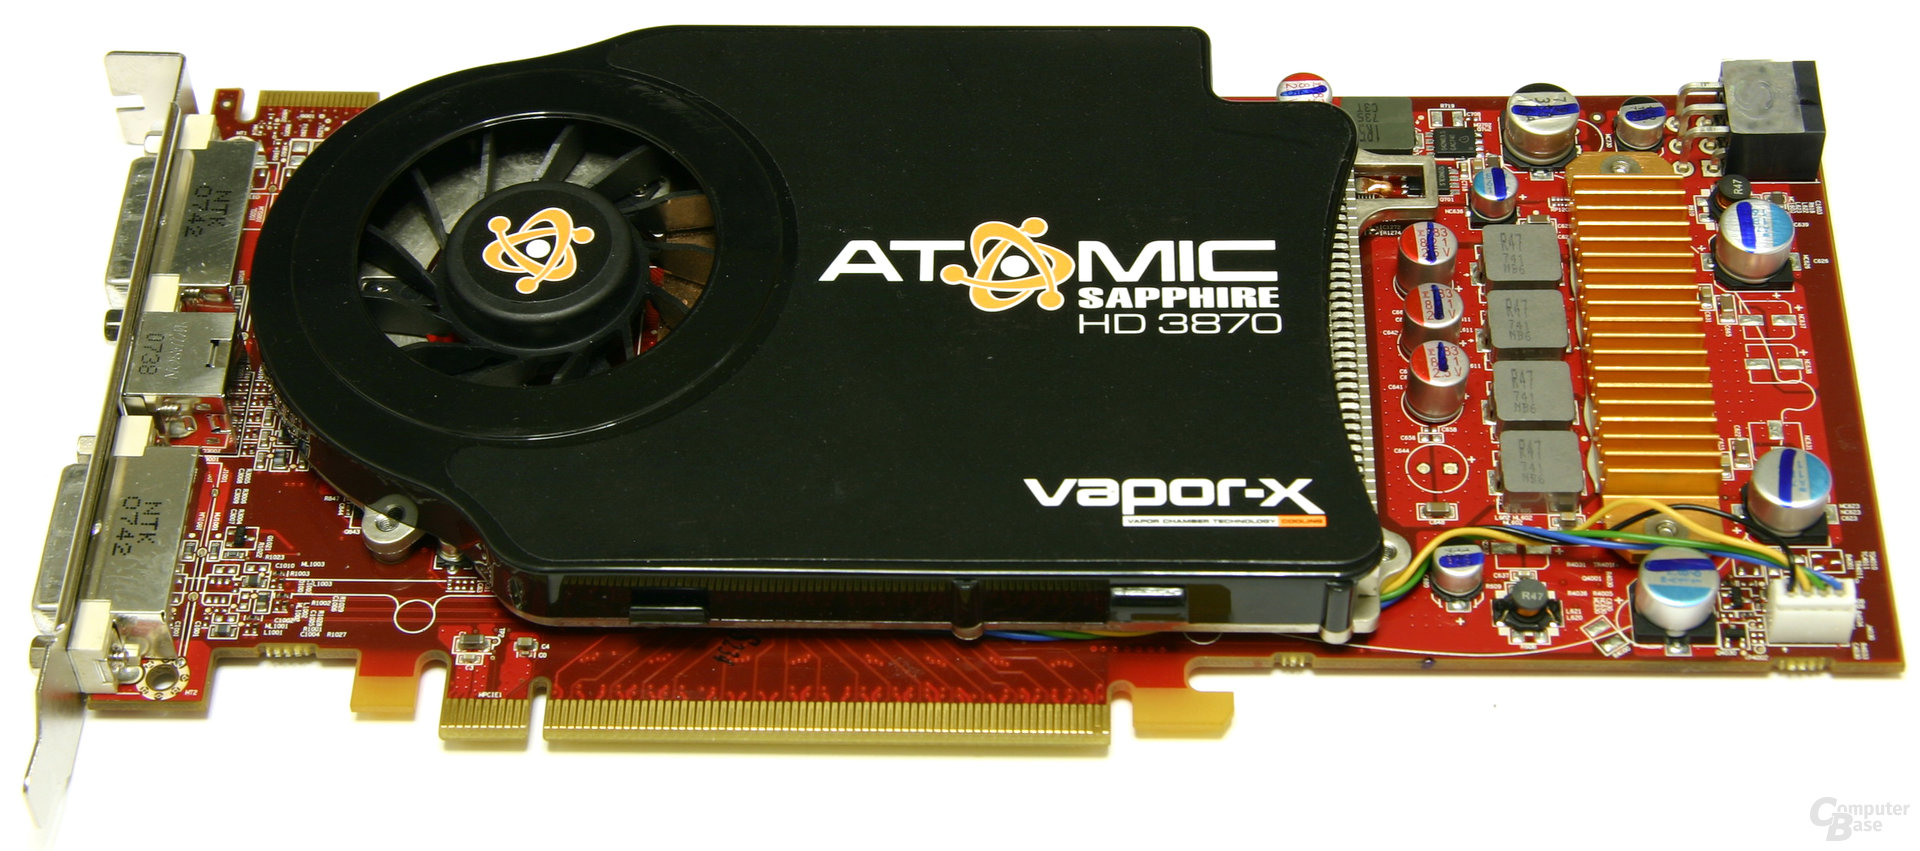 Sapphire Atomic HD 3870